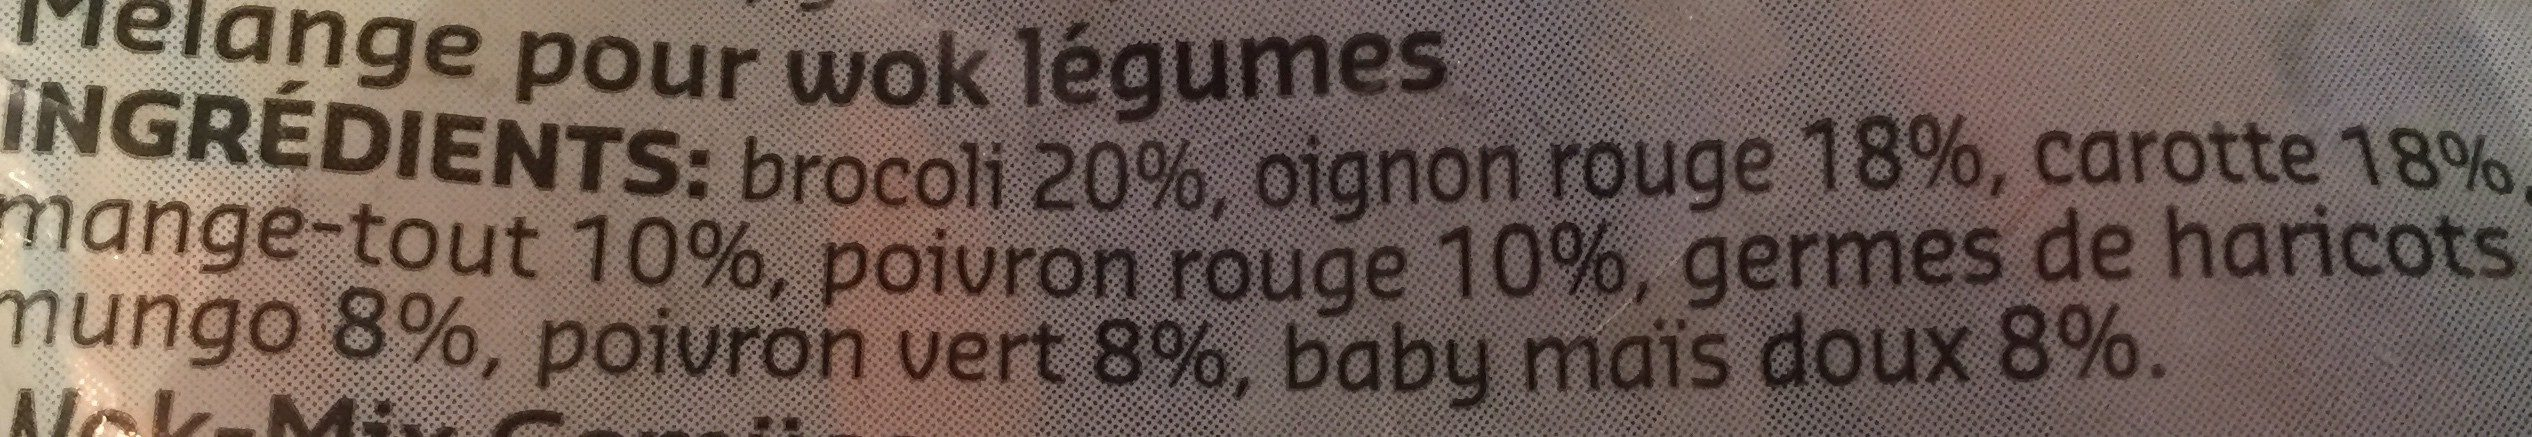 Melange pour wok legume - Ingrédients - fr